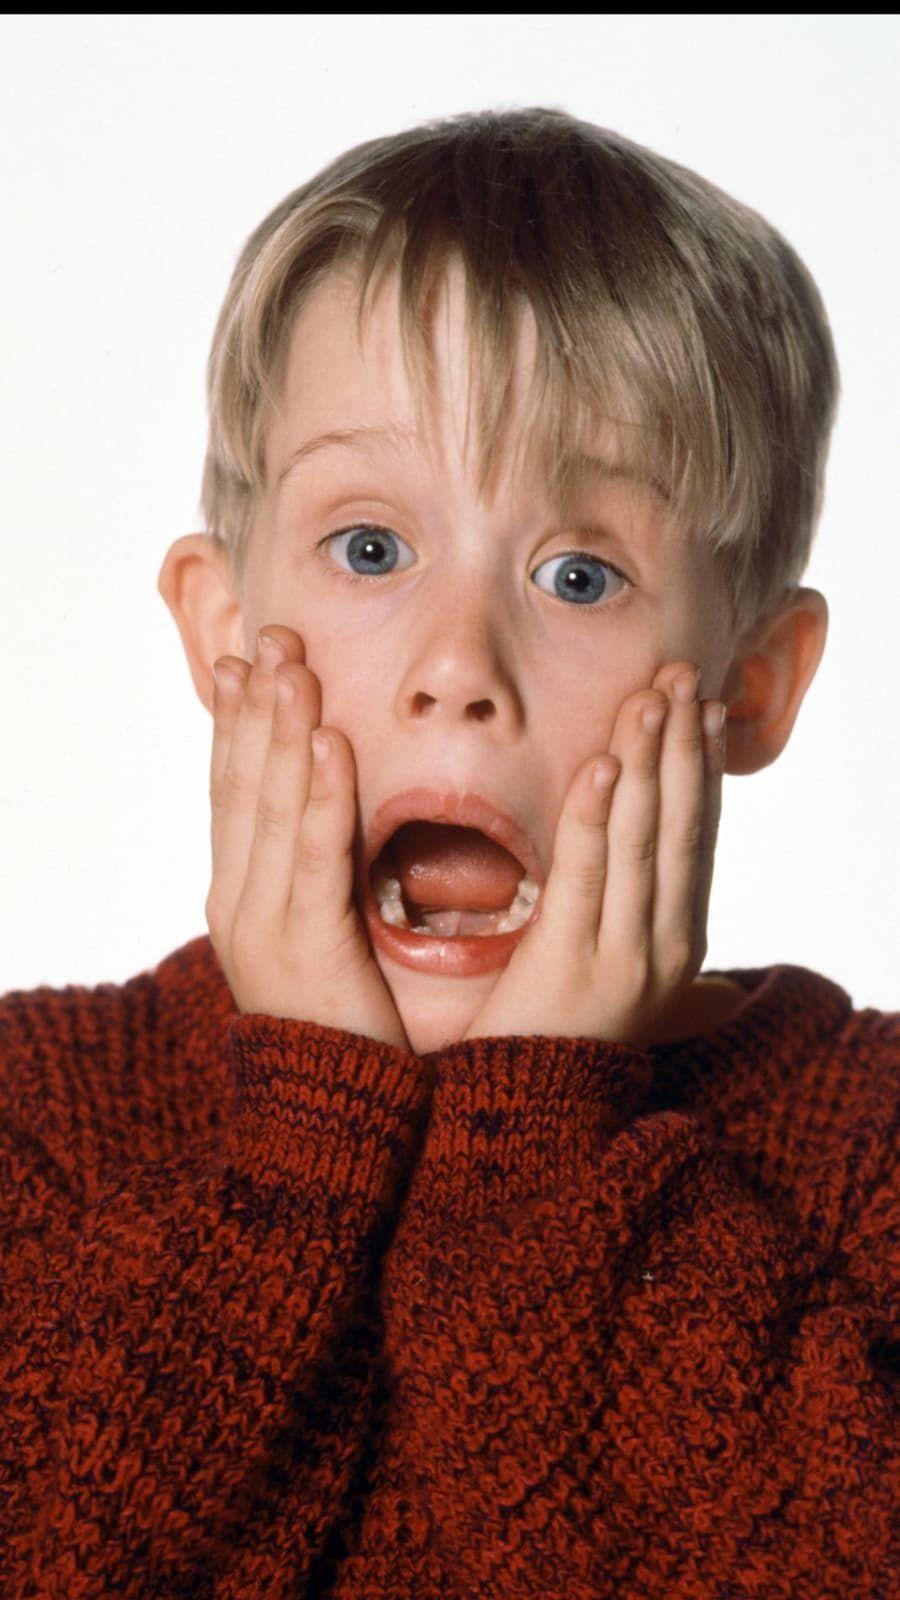 Macaulay Culkin Im Film Allein Zu Hause Macaulay Culkin Im Film Allein Zu Hause Https E10 Veryeasyforme Com 2020 In 2020 Home Alone Movie Kevin Home Alone